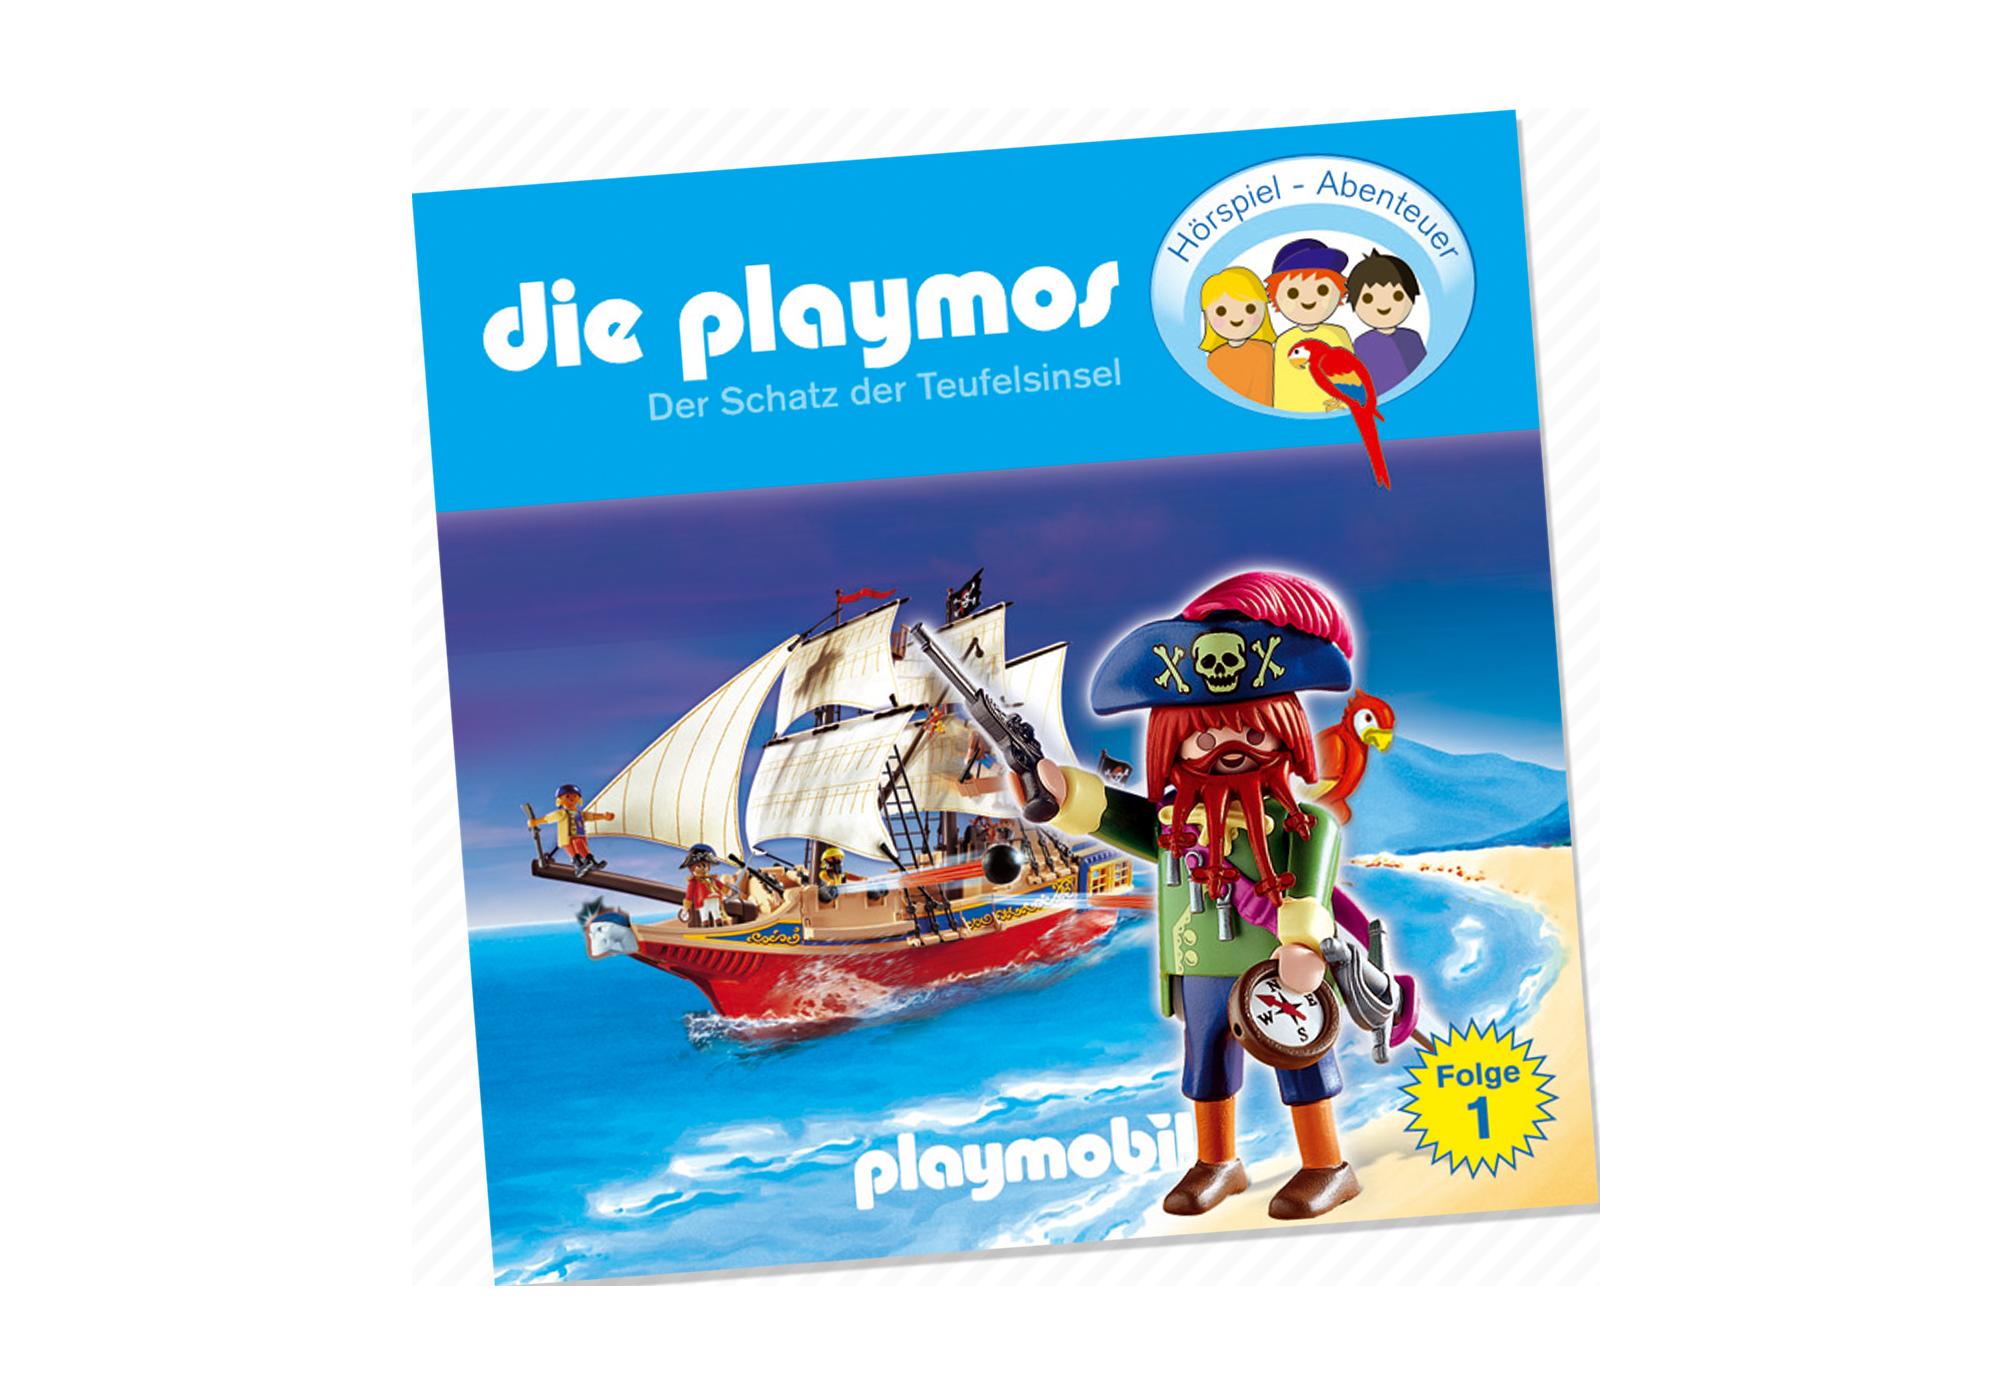 http://media.playmobil.com/i/playmobil/80128_product_detail/Der Schatz der Teufelsinsel (1) - CD